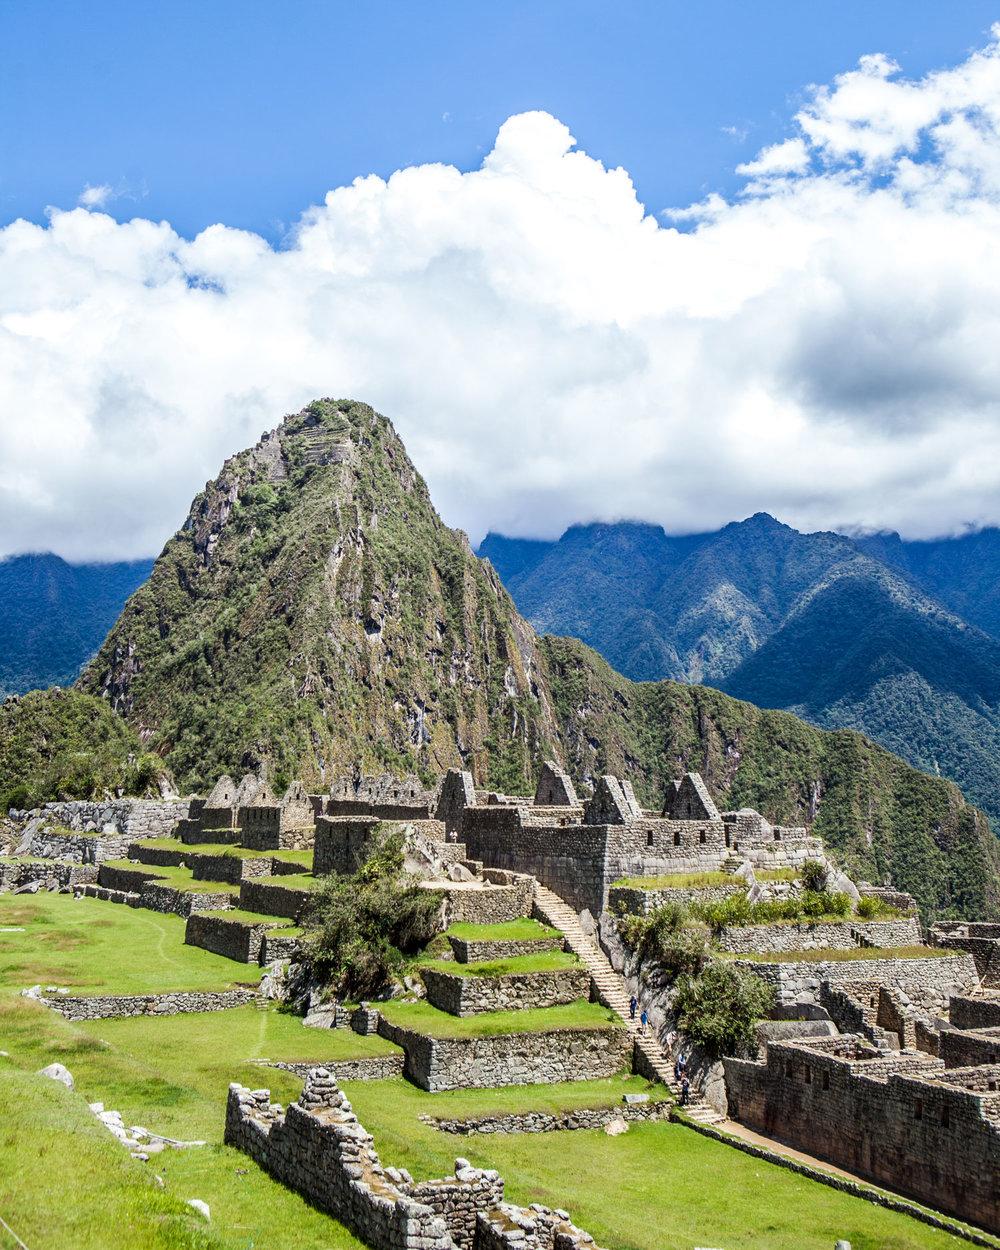 Machu-Picchu-Peru-wander-south-huaynapicchu-8.jpg